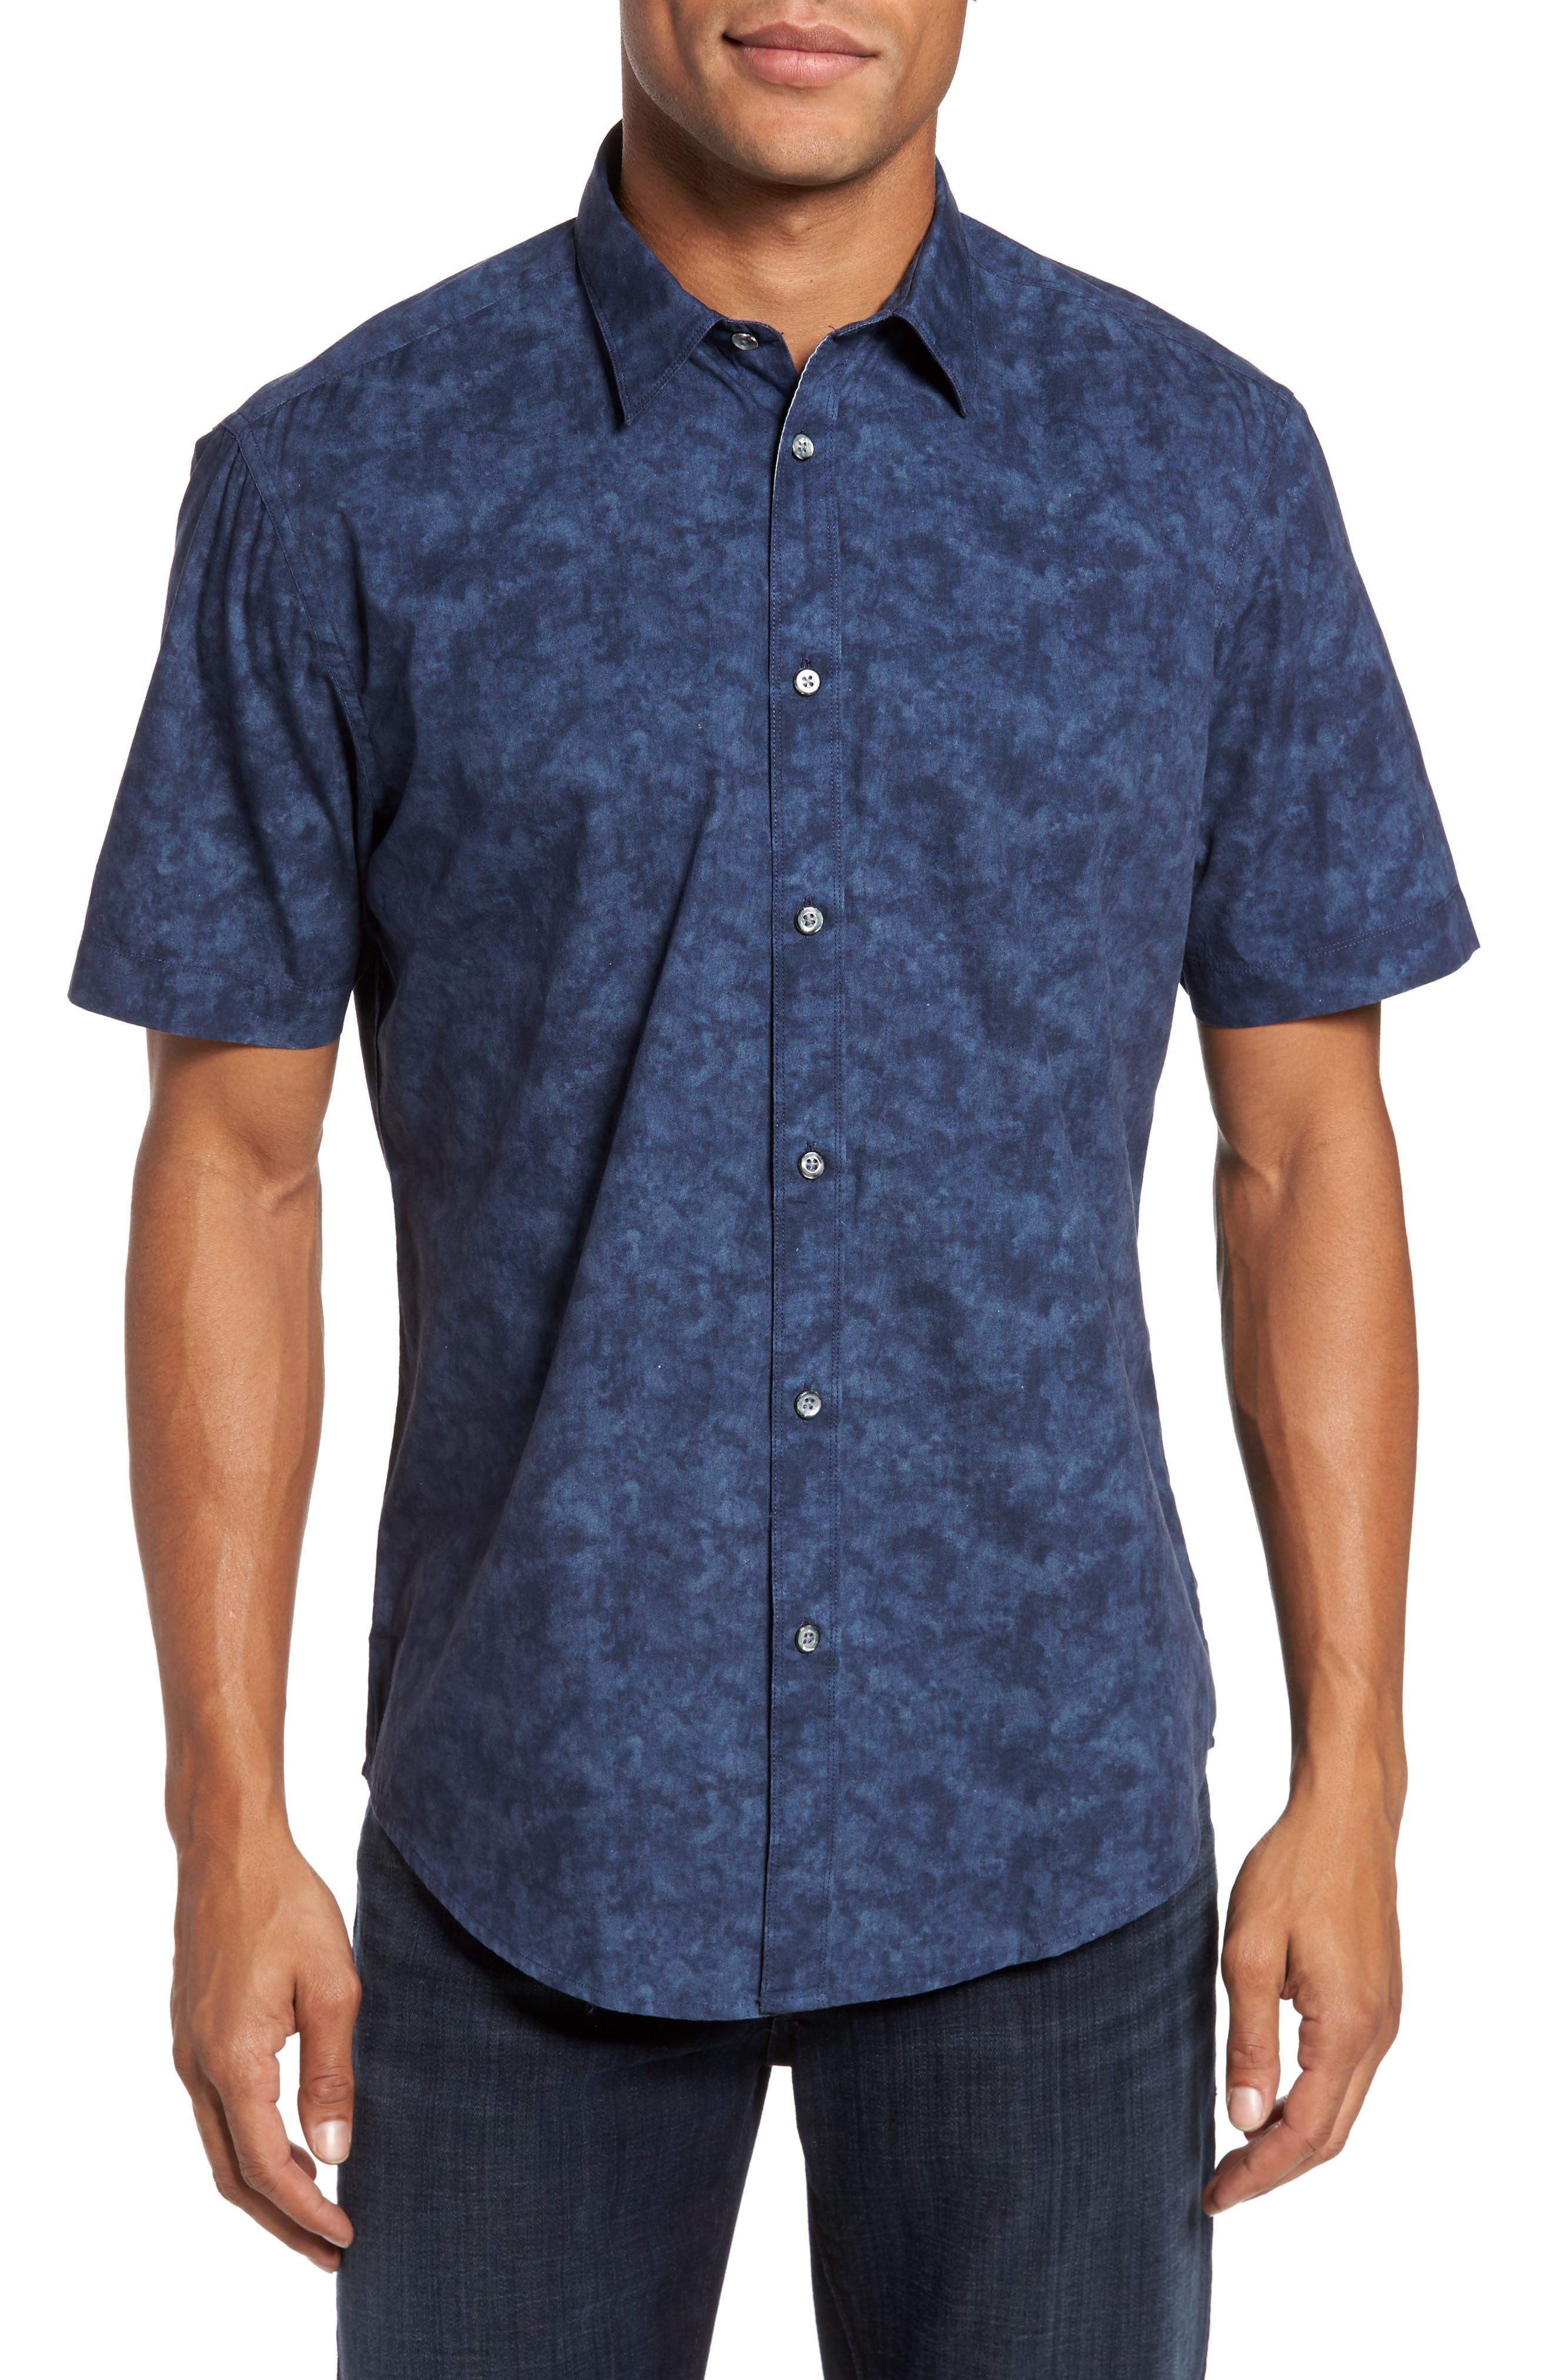 Alternate Image 1 Selected - Coastaoro Seaside Regular Fit Print Sport Shirt